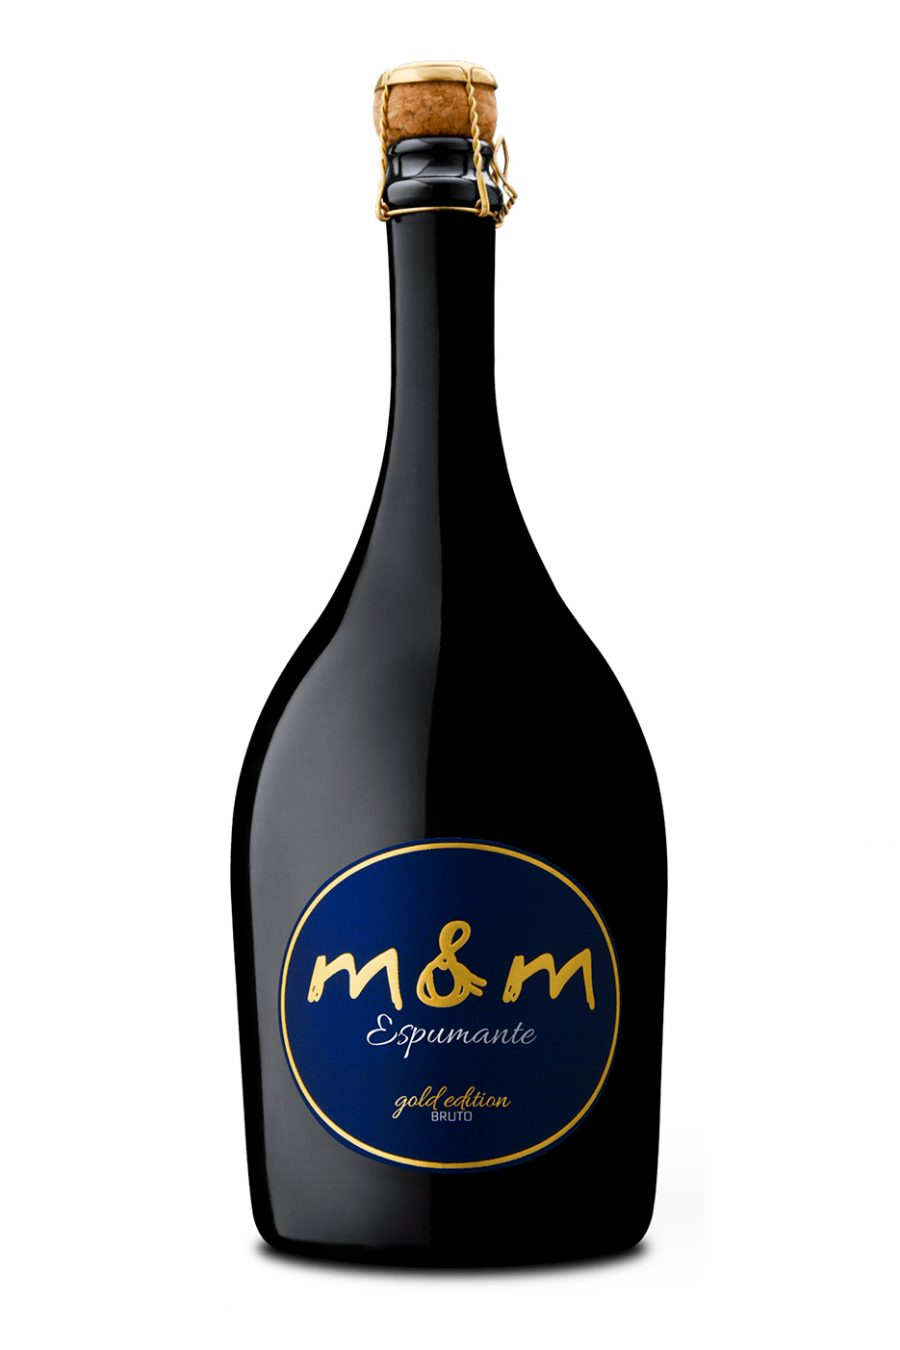 M&M Gold Branco Bruto